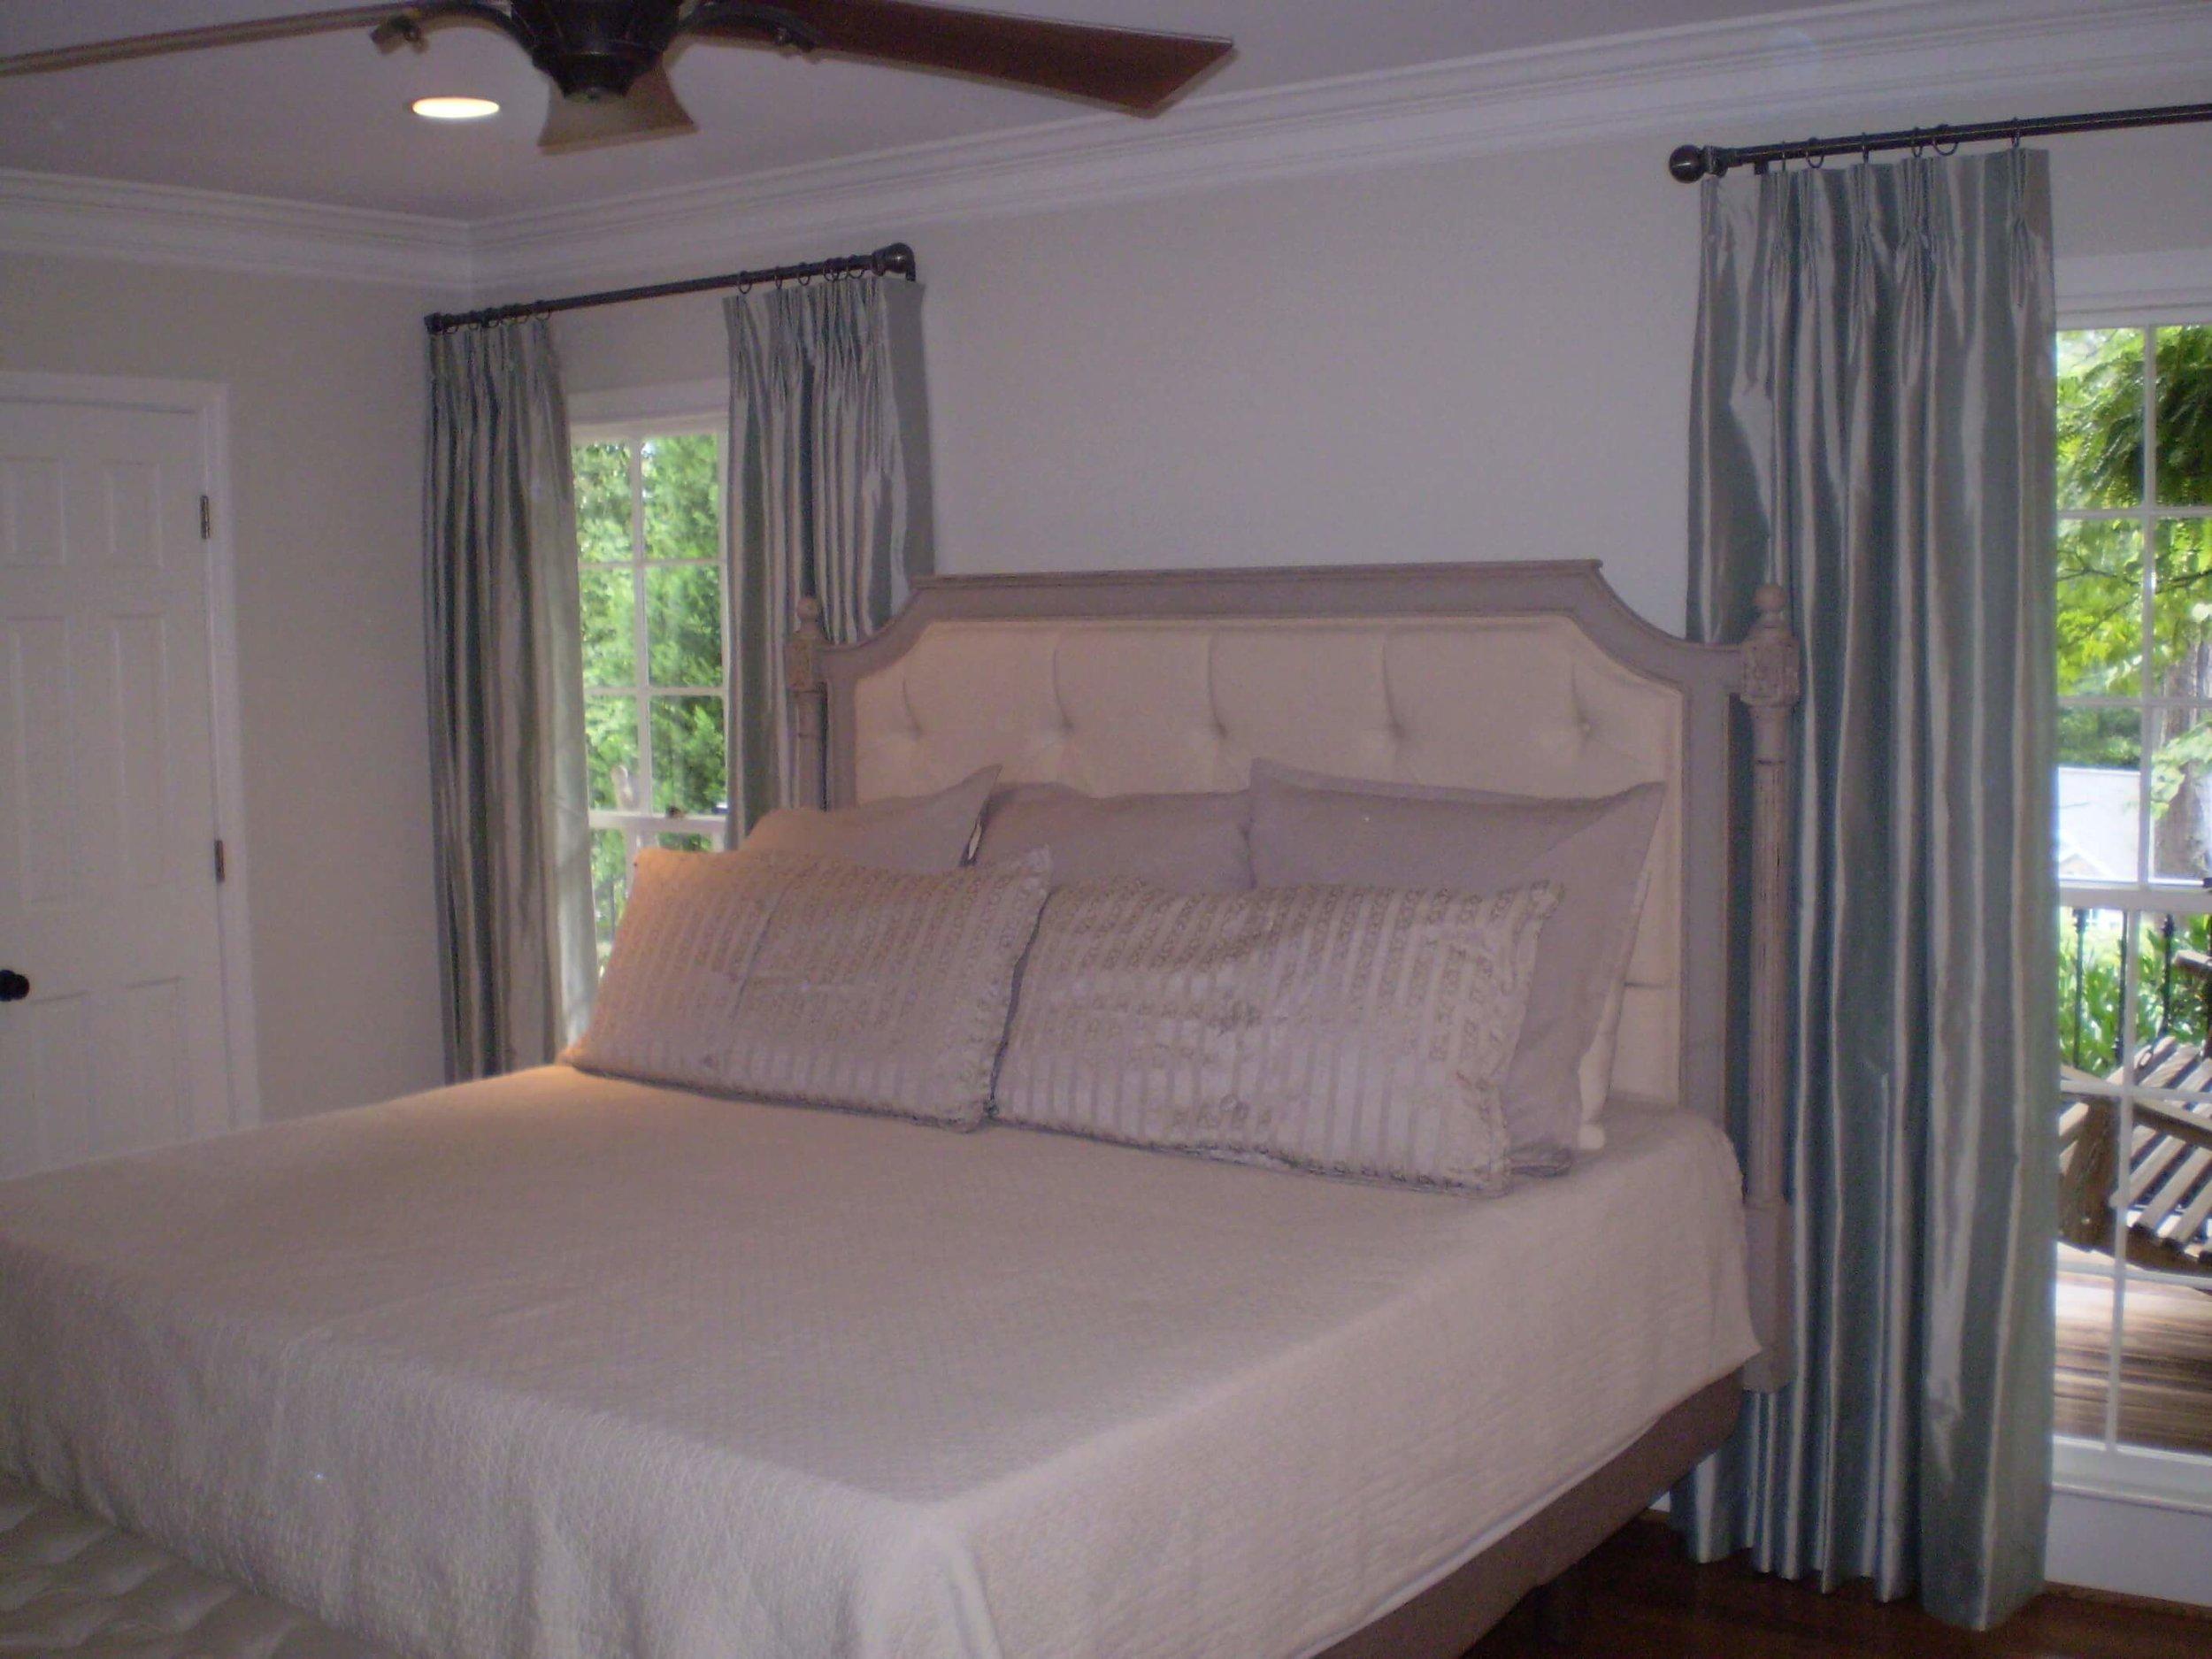 custom-bedding-linens-fabric-atlanta-georgia-1.JPG